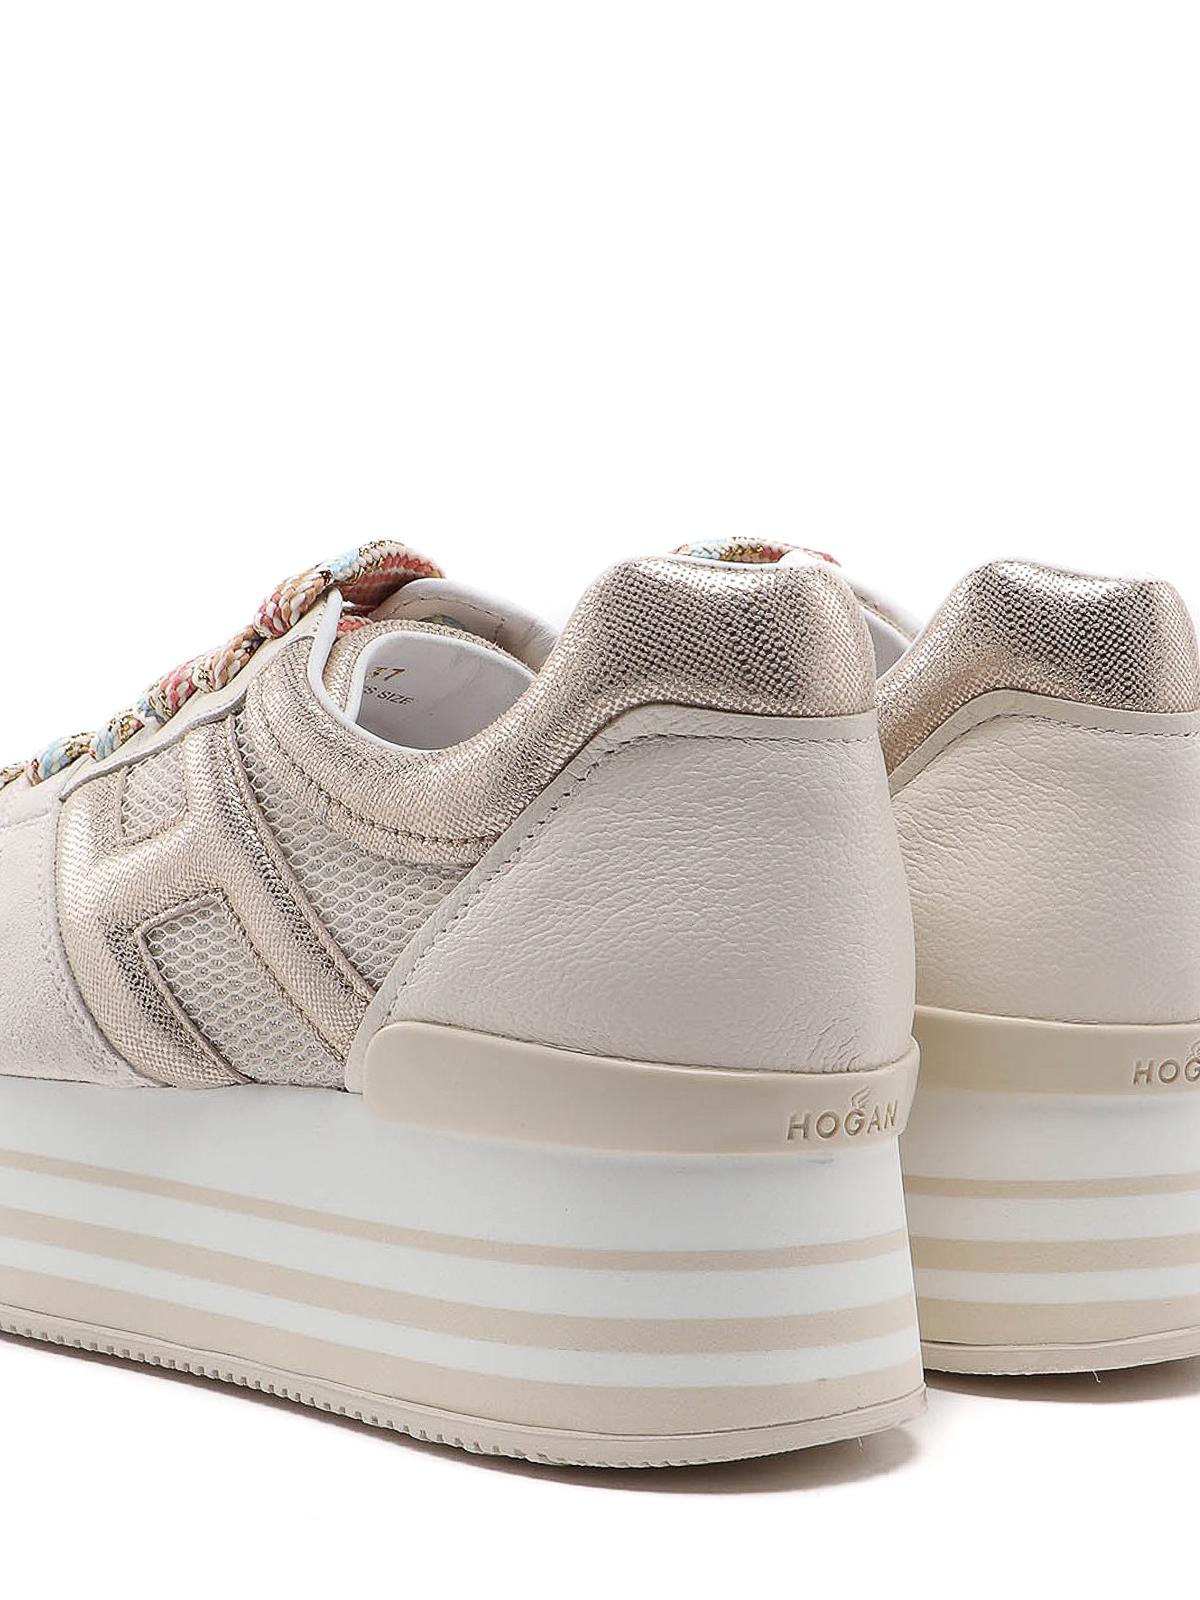 Trainers Hogan - Maxi H222 sneakers - HXW2830U352N8E0QQT   iKRIX.com